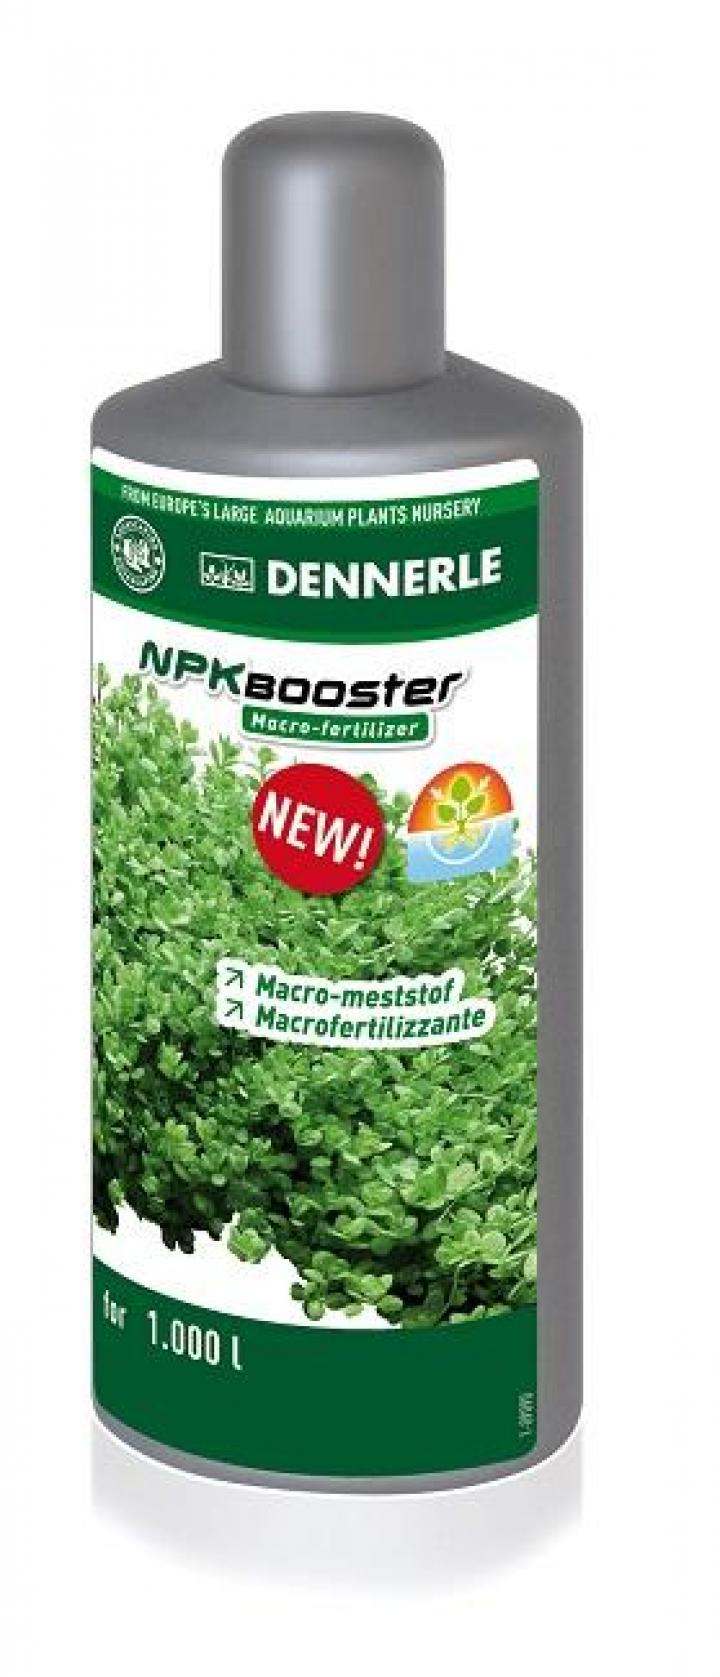 Dennerle - NPK Booster 100 ml